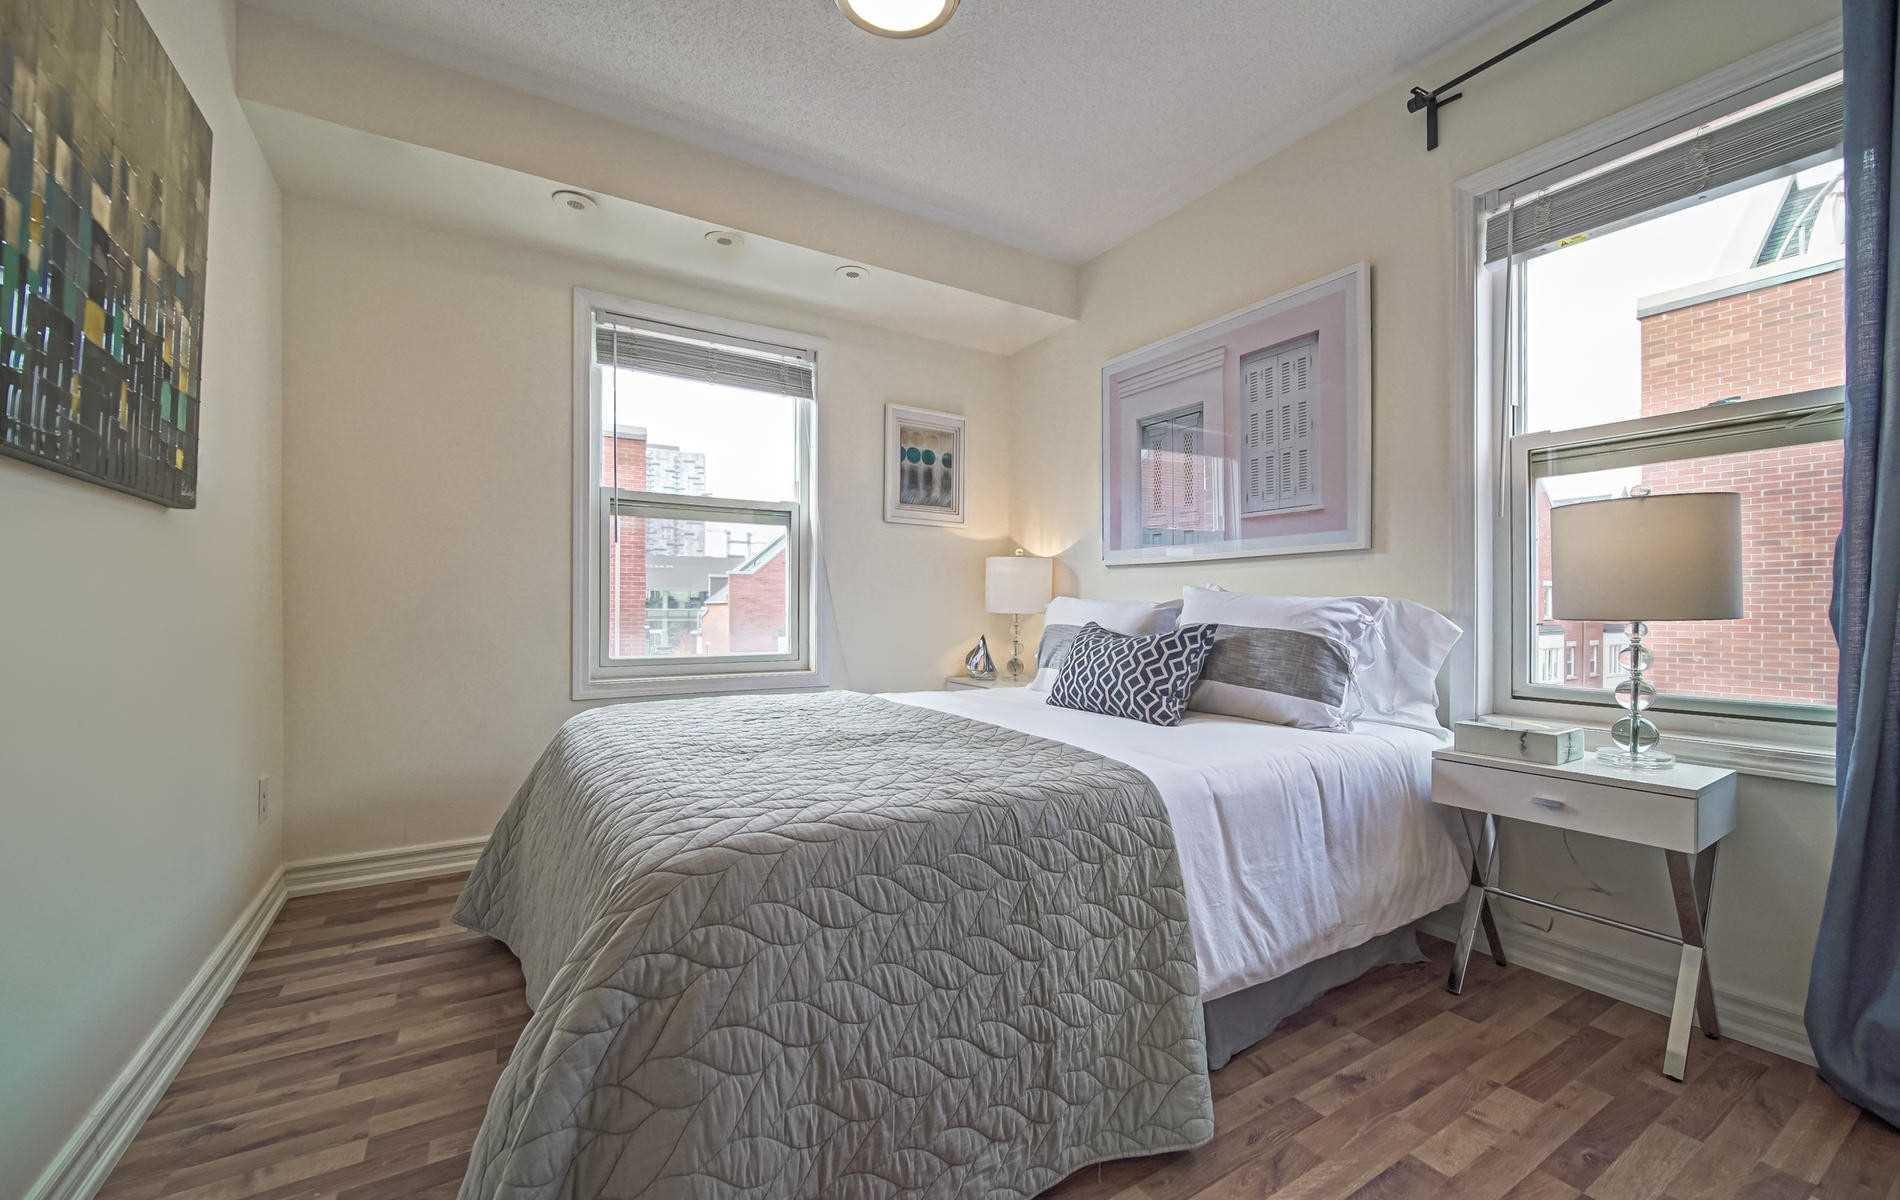 Photo 11: Photos: 3 78 Munro Street in Toronto: South Riverdale Condo for sale (Toronto E01)  : MLS®# E4615987